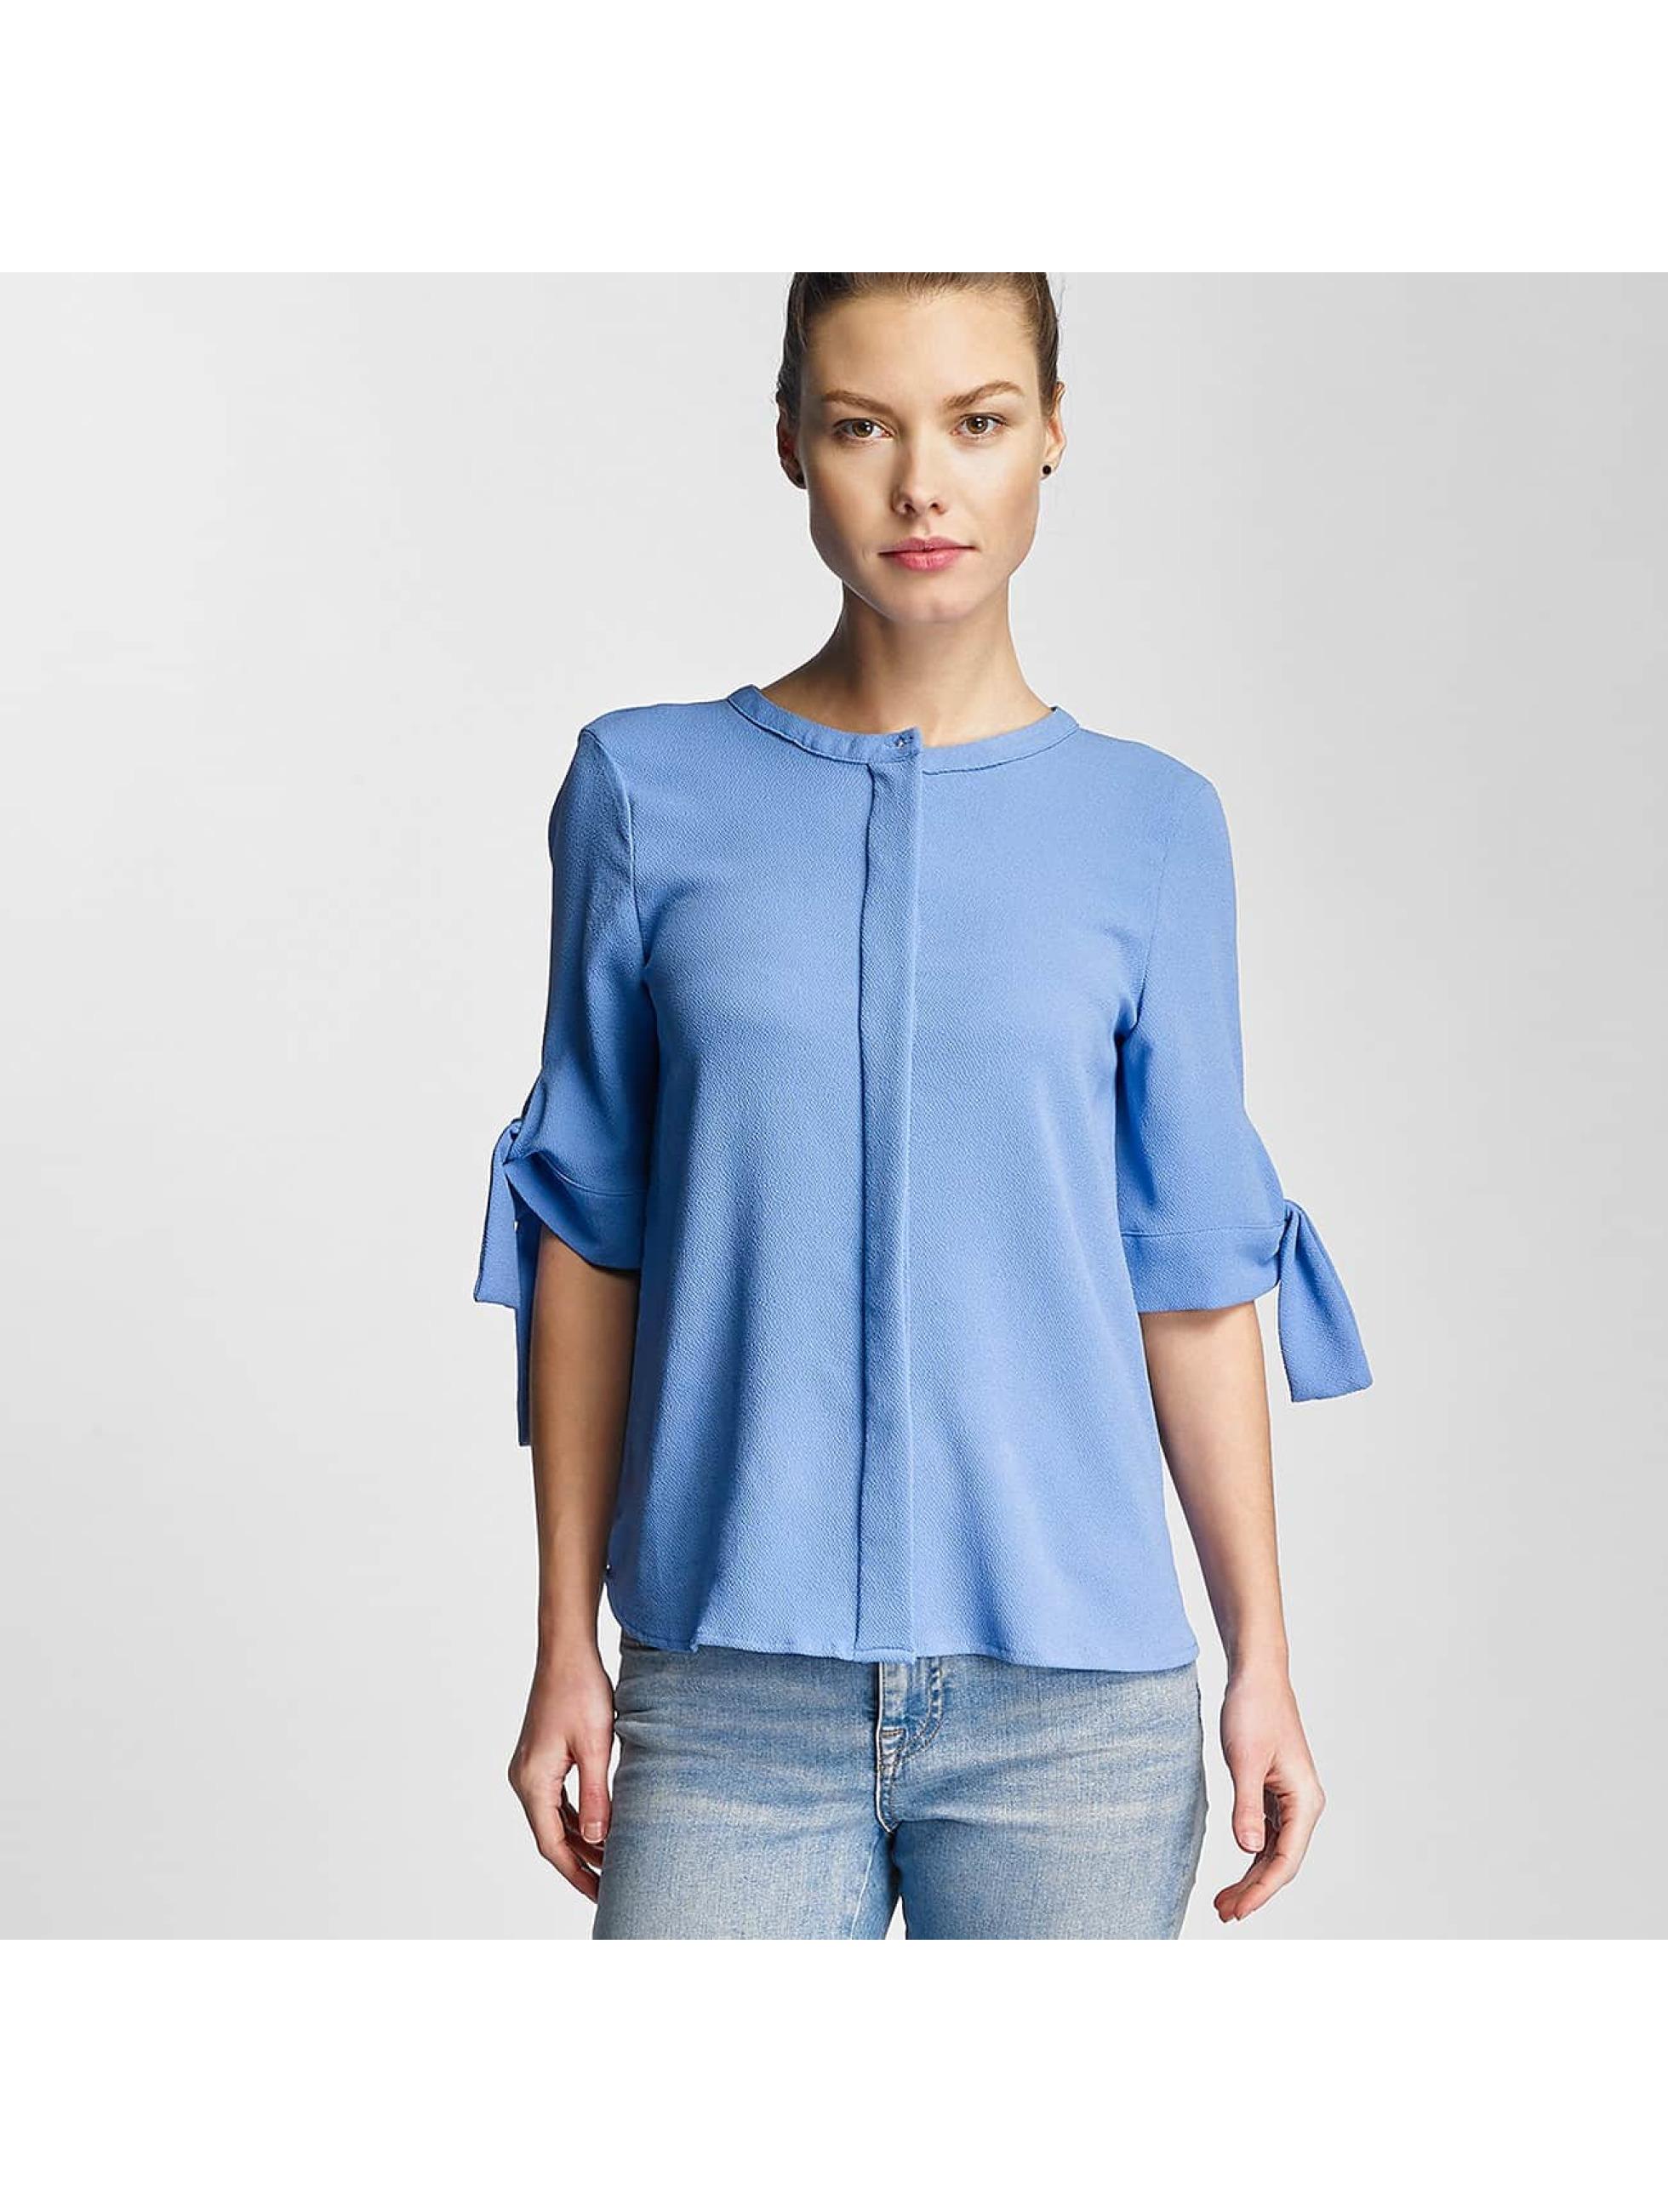 Vero Moda Bluse VmGertrud blau